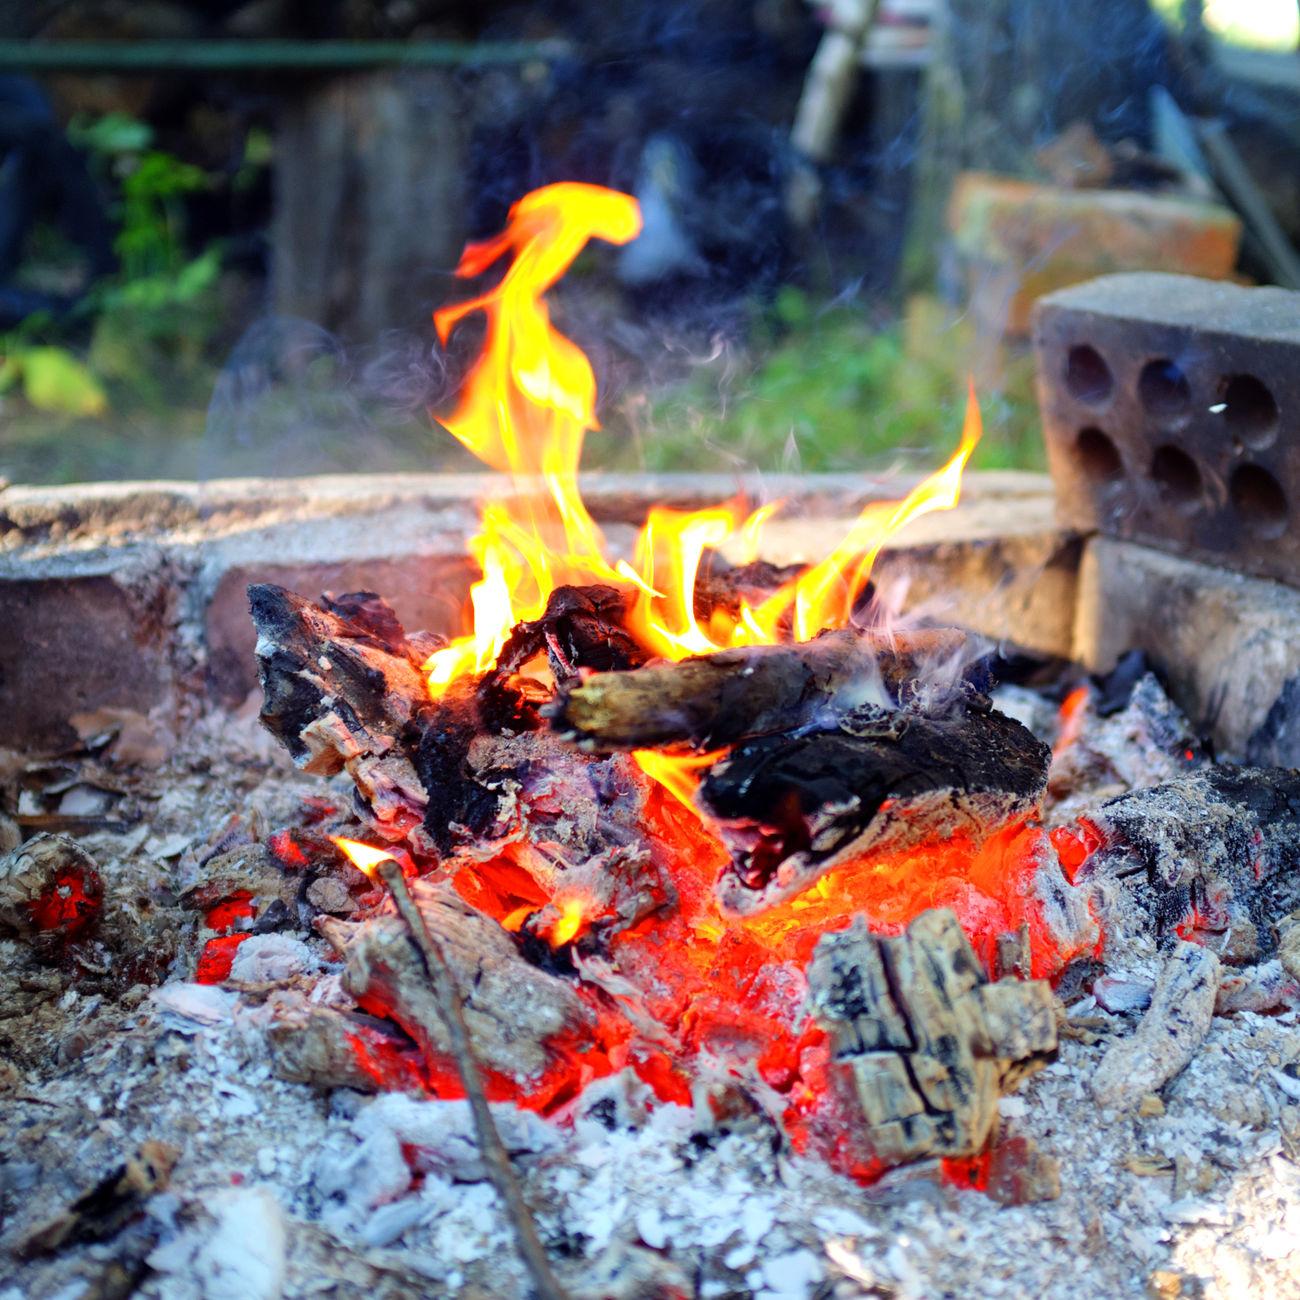 огонь костер пламя дрова